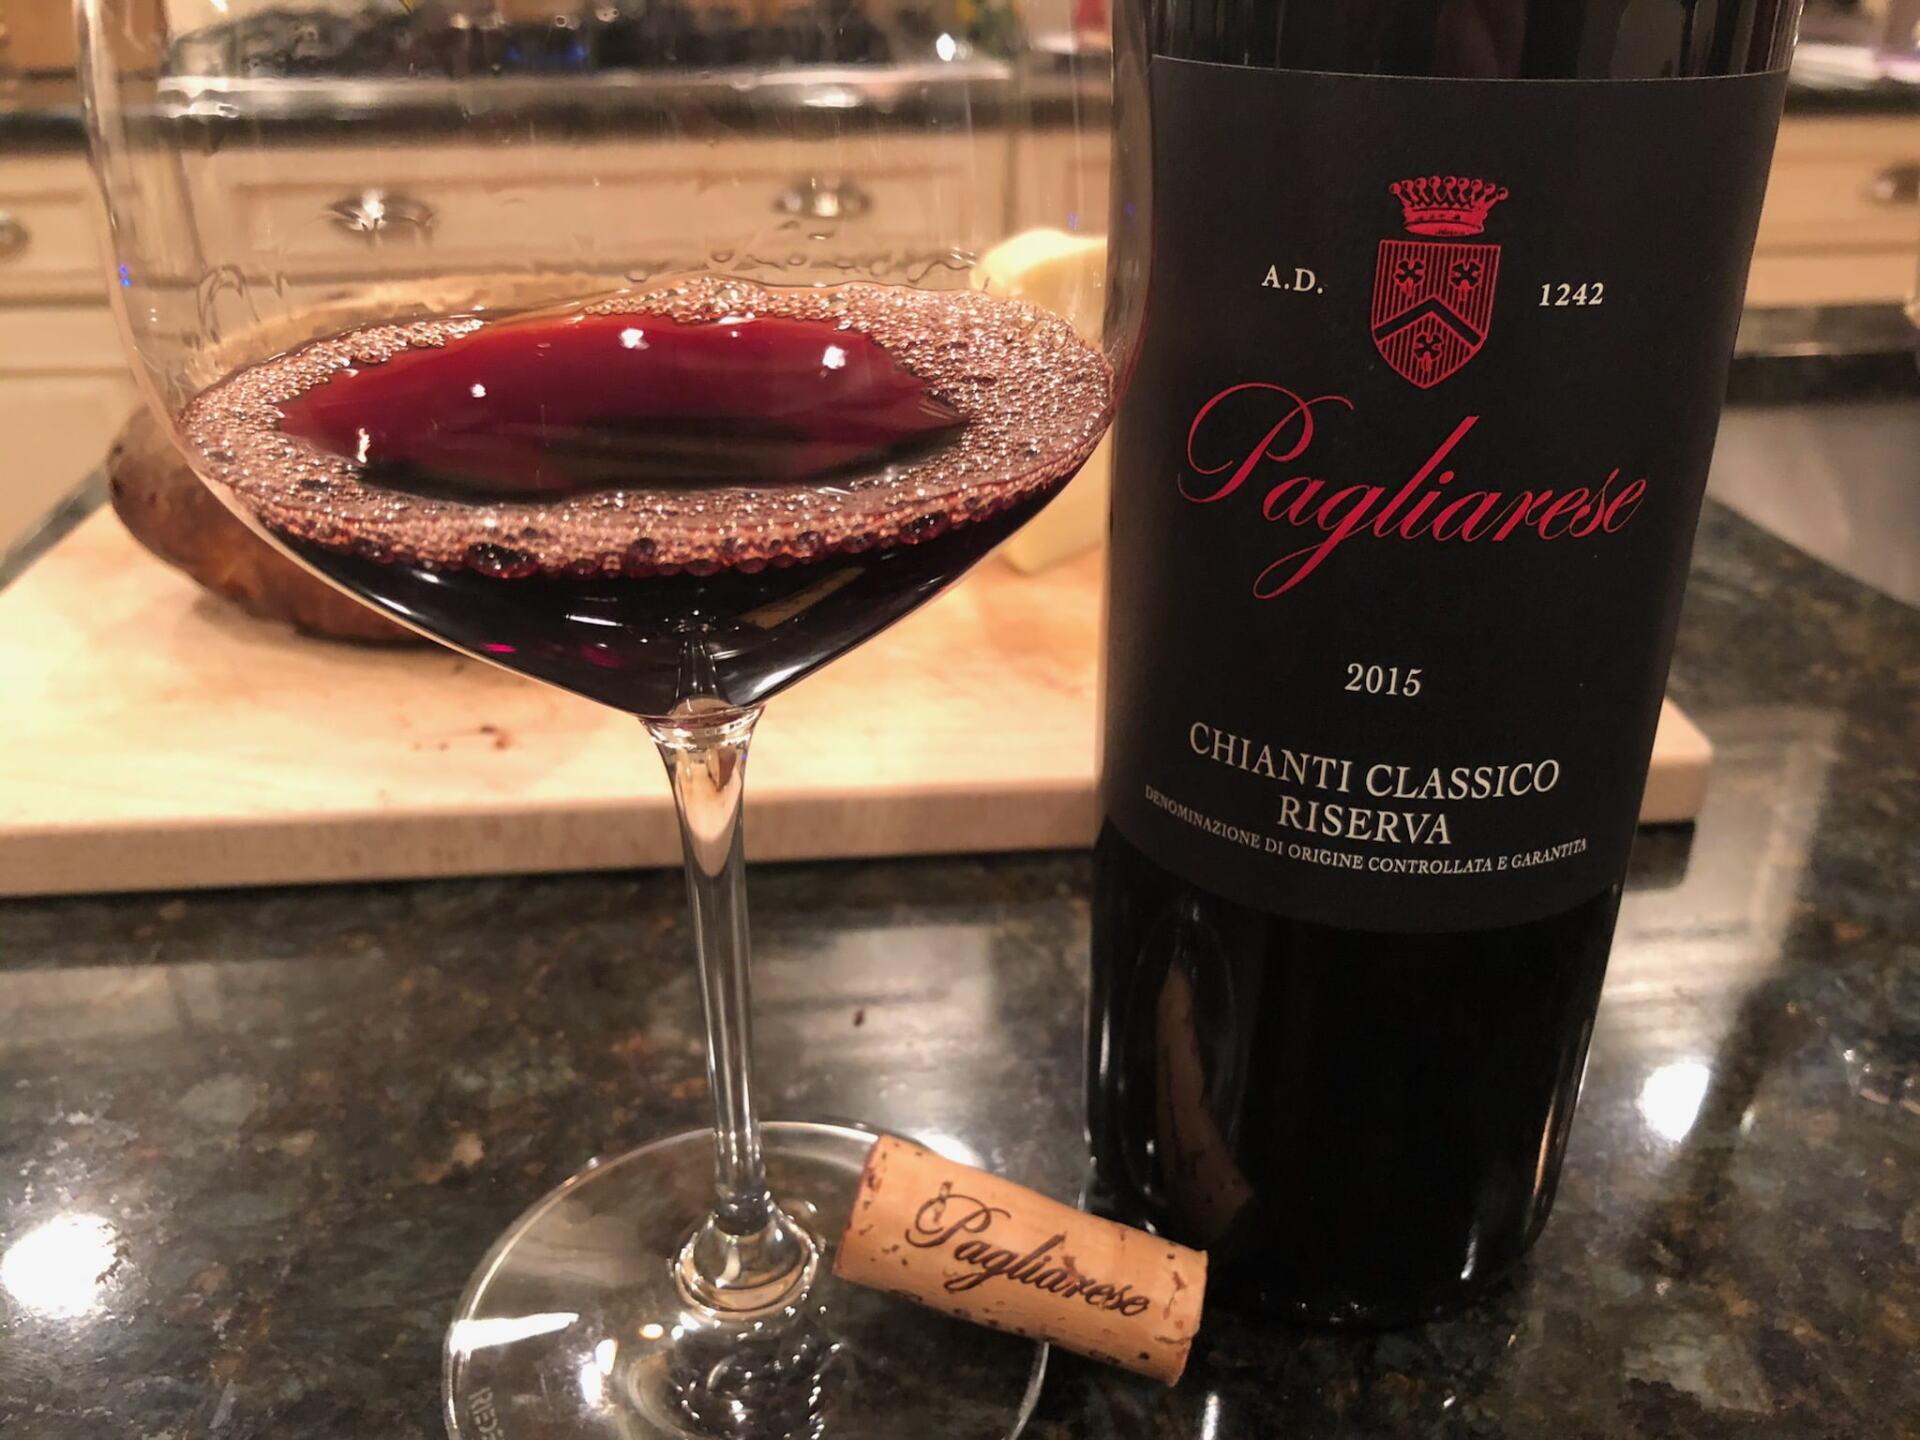 Pagliarese Wine